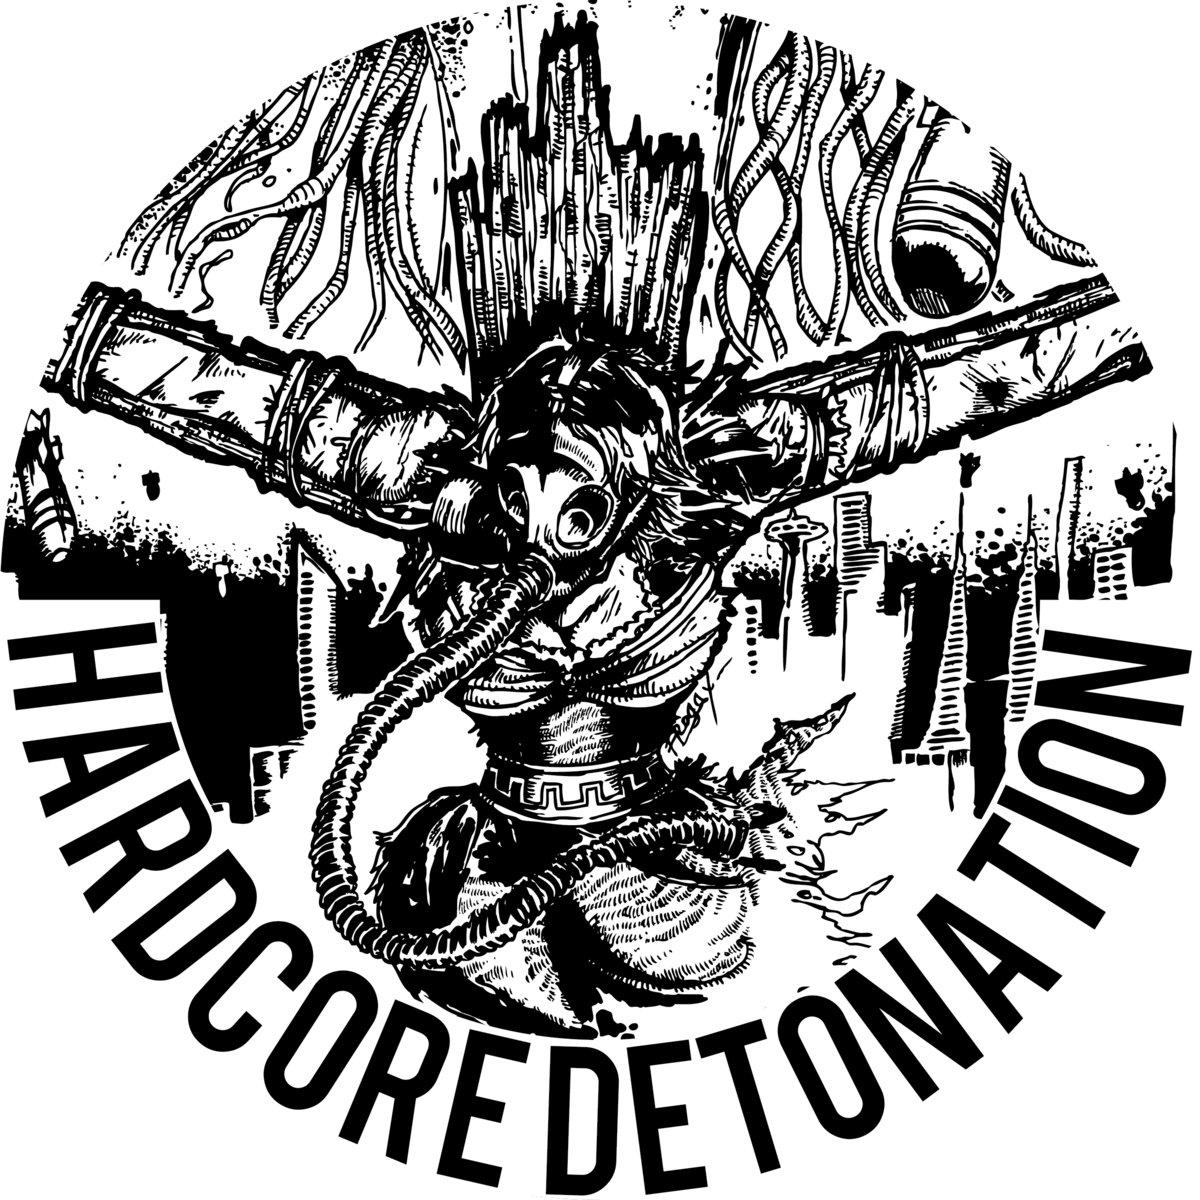 HARDCORE DETONATION